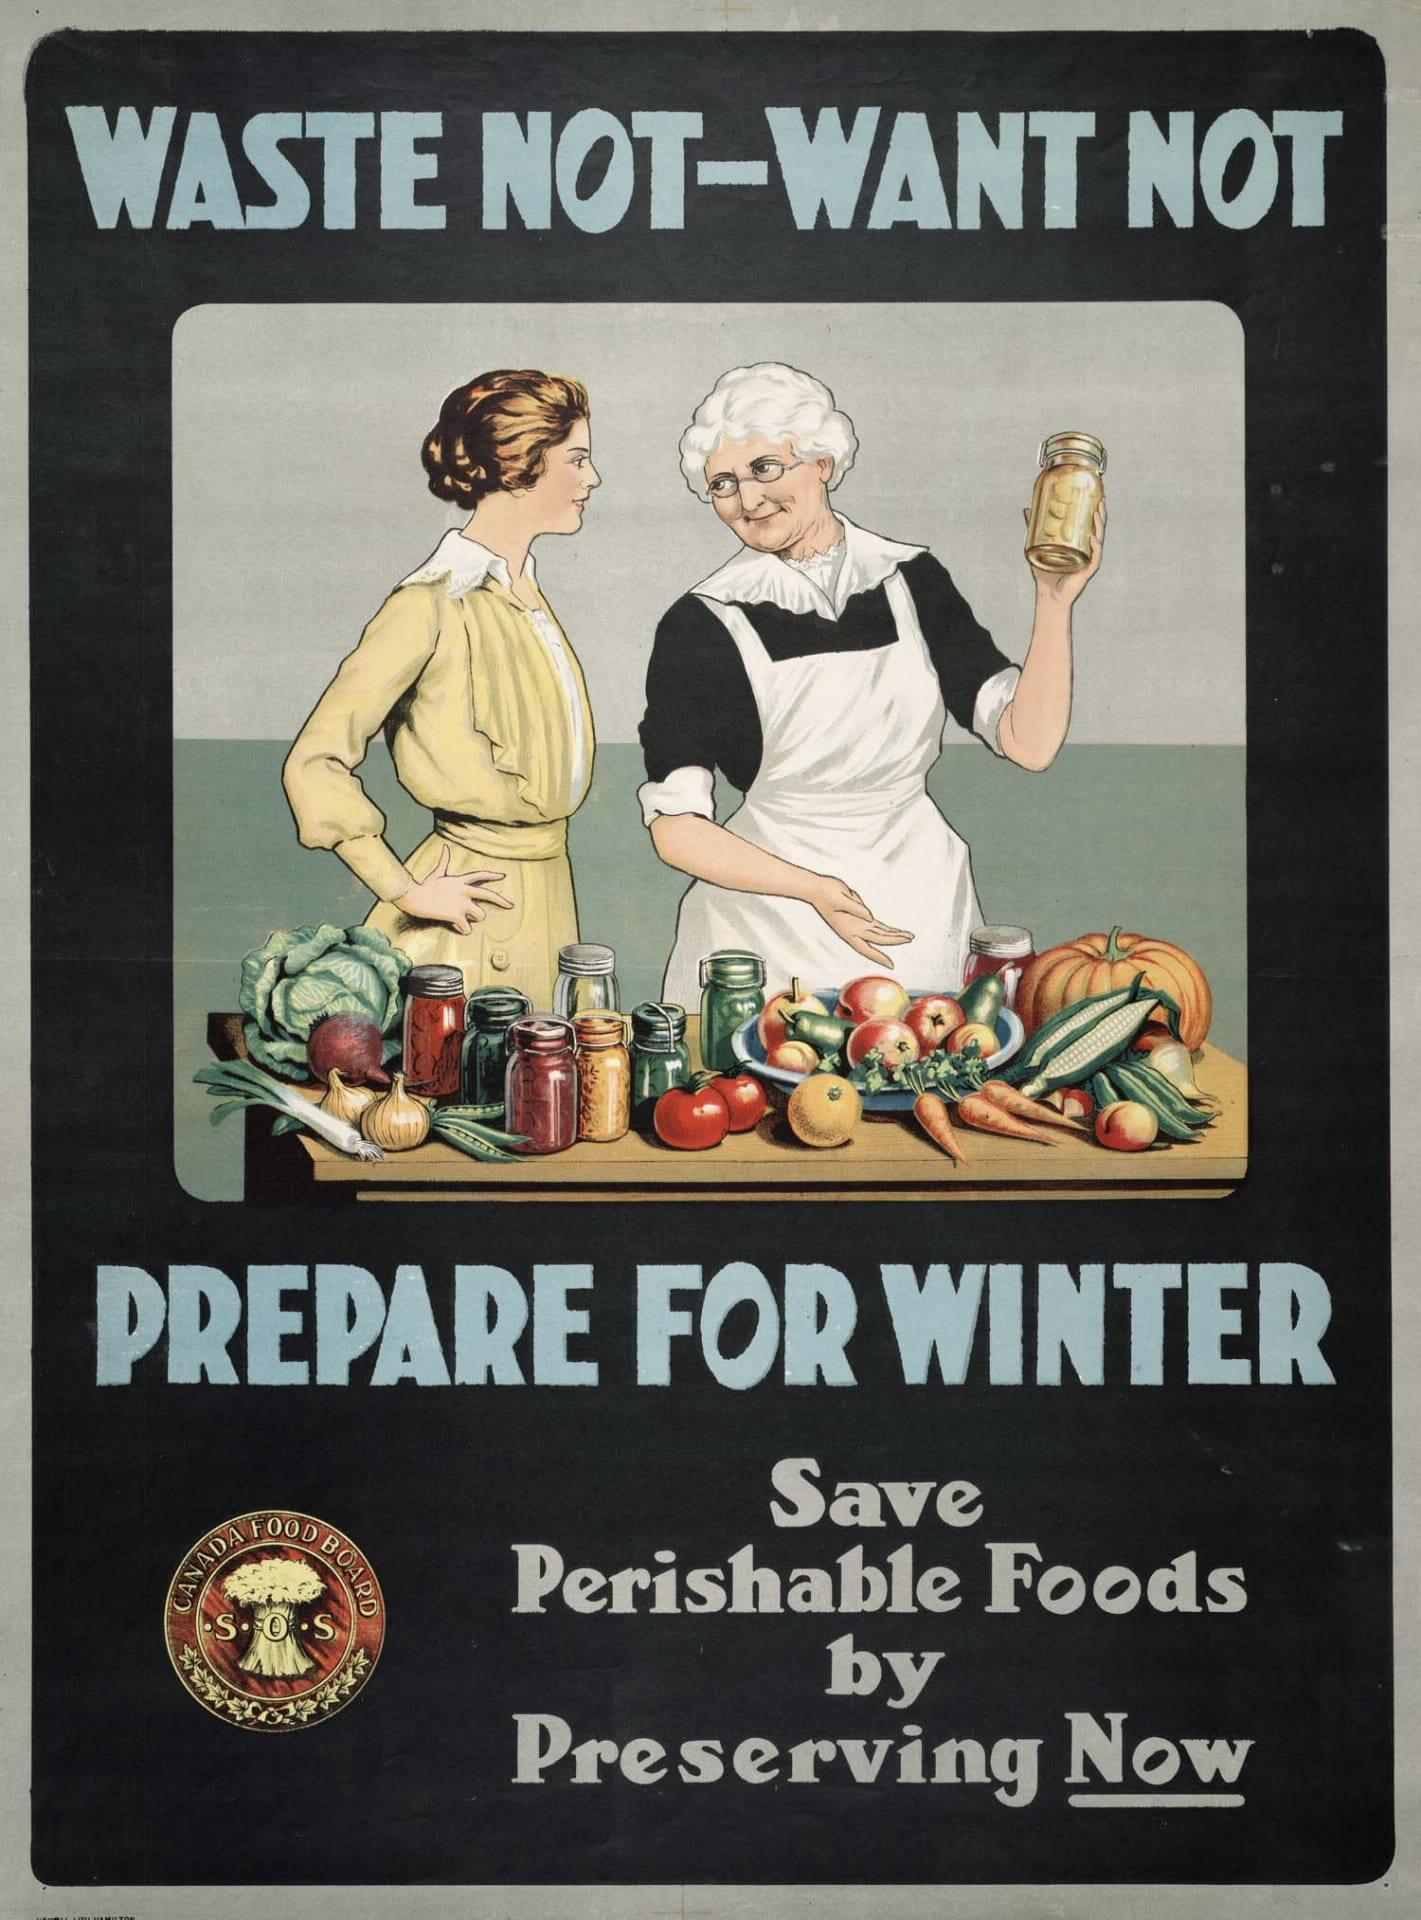 War propoganda poster